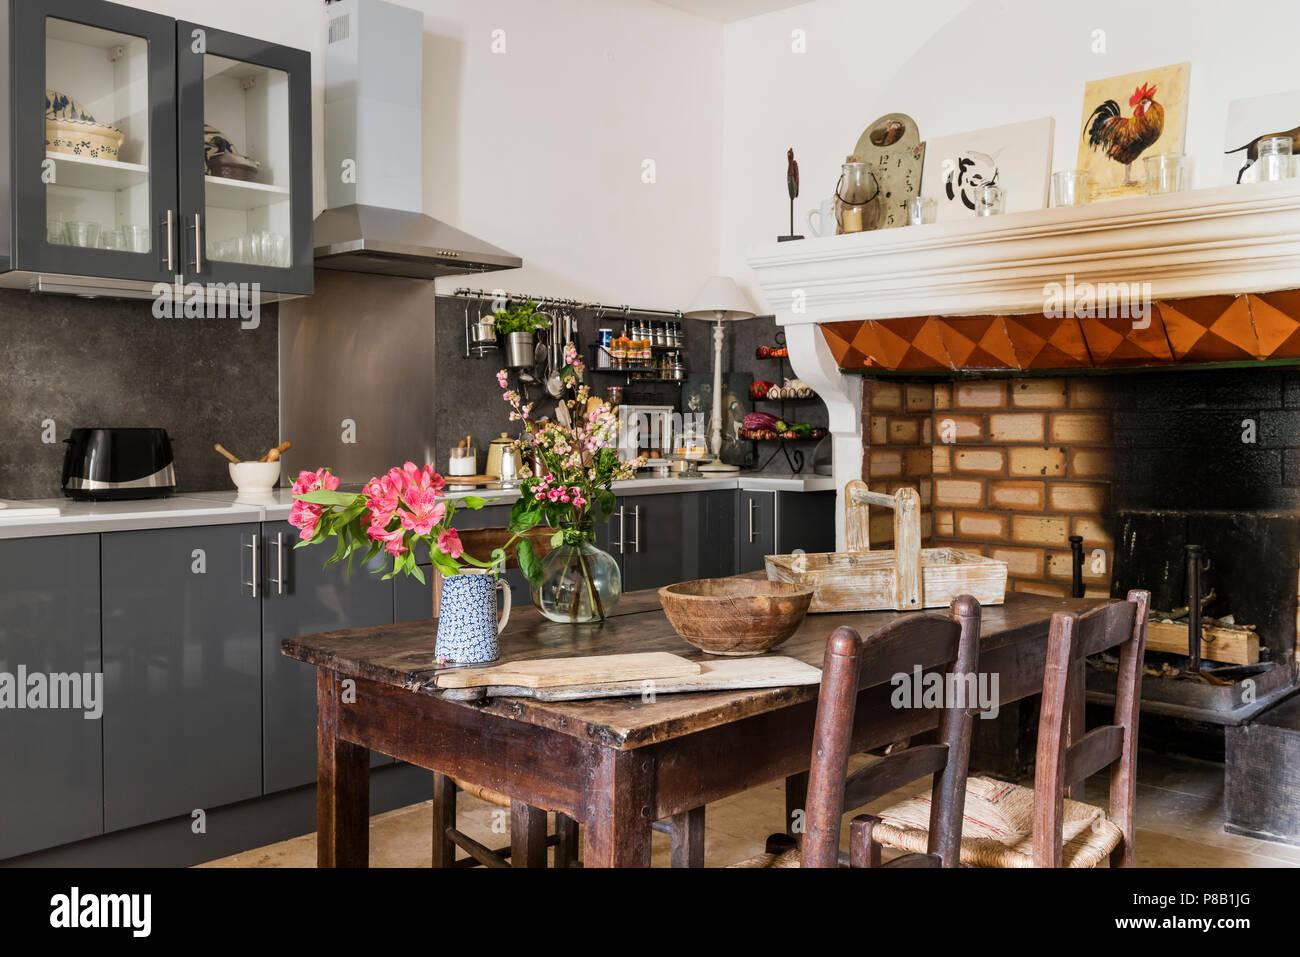 Cuisine Melange Ancien Et Moderne cuisine ancienne et moderne